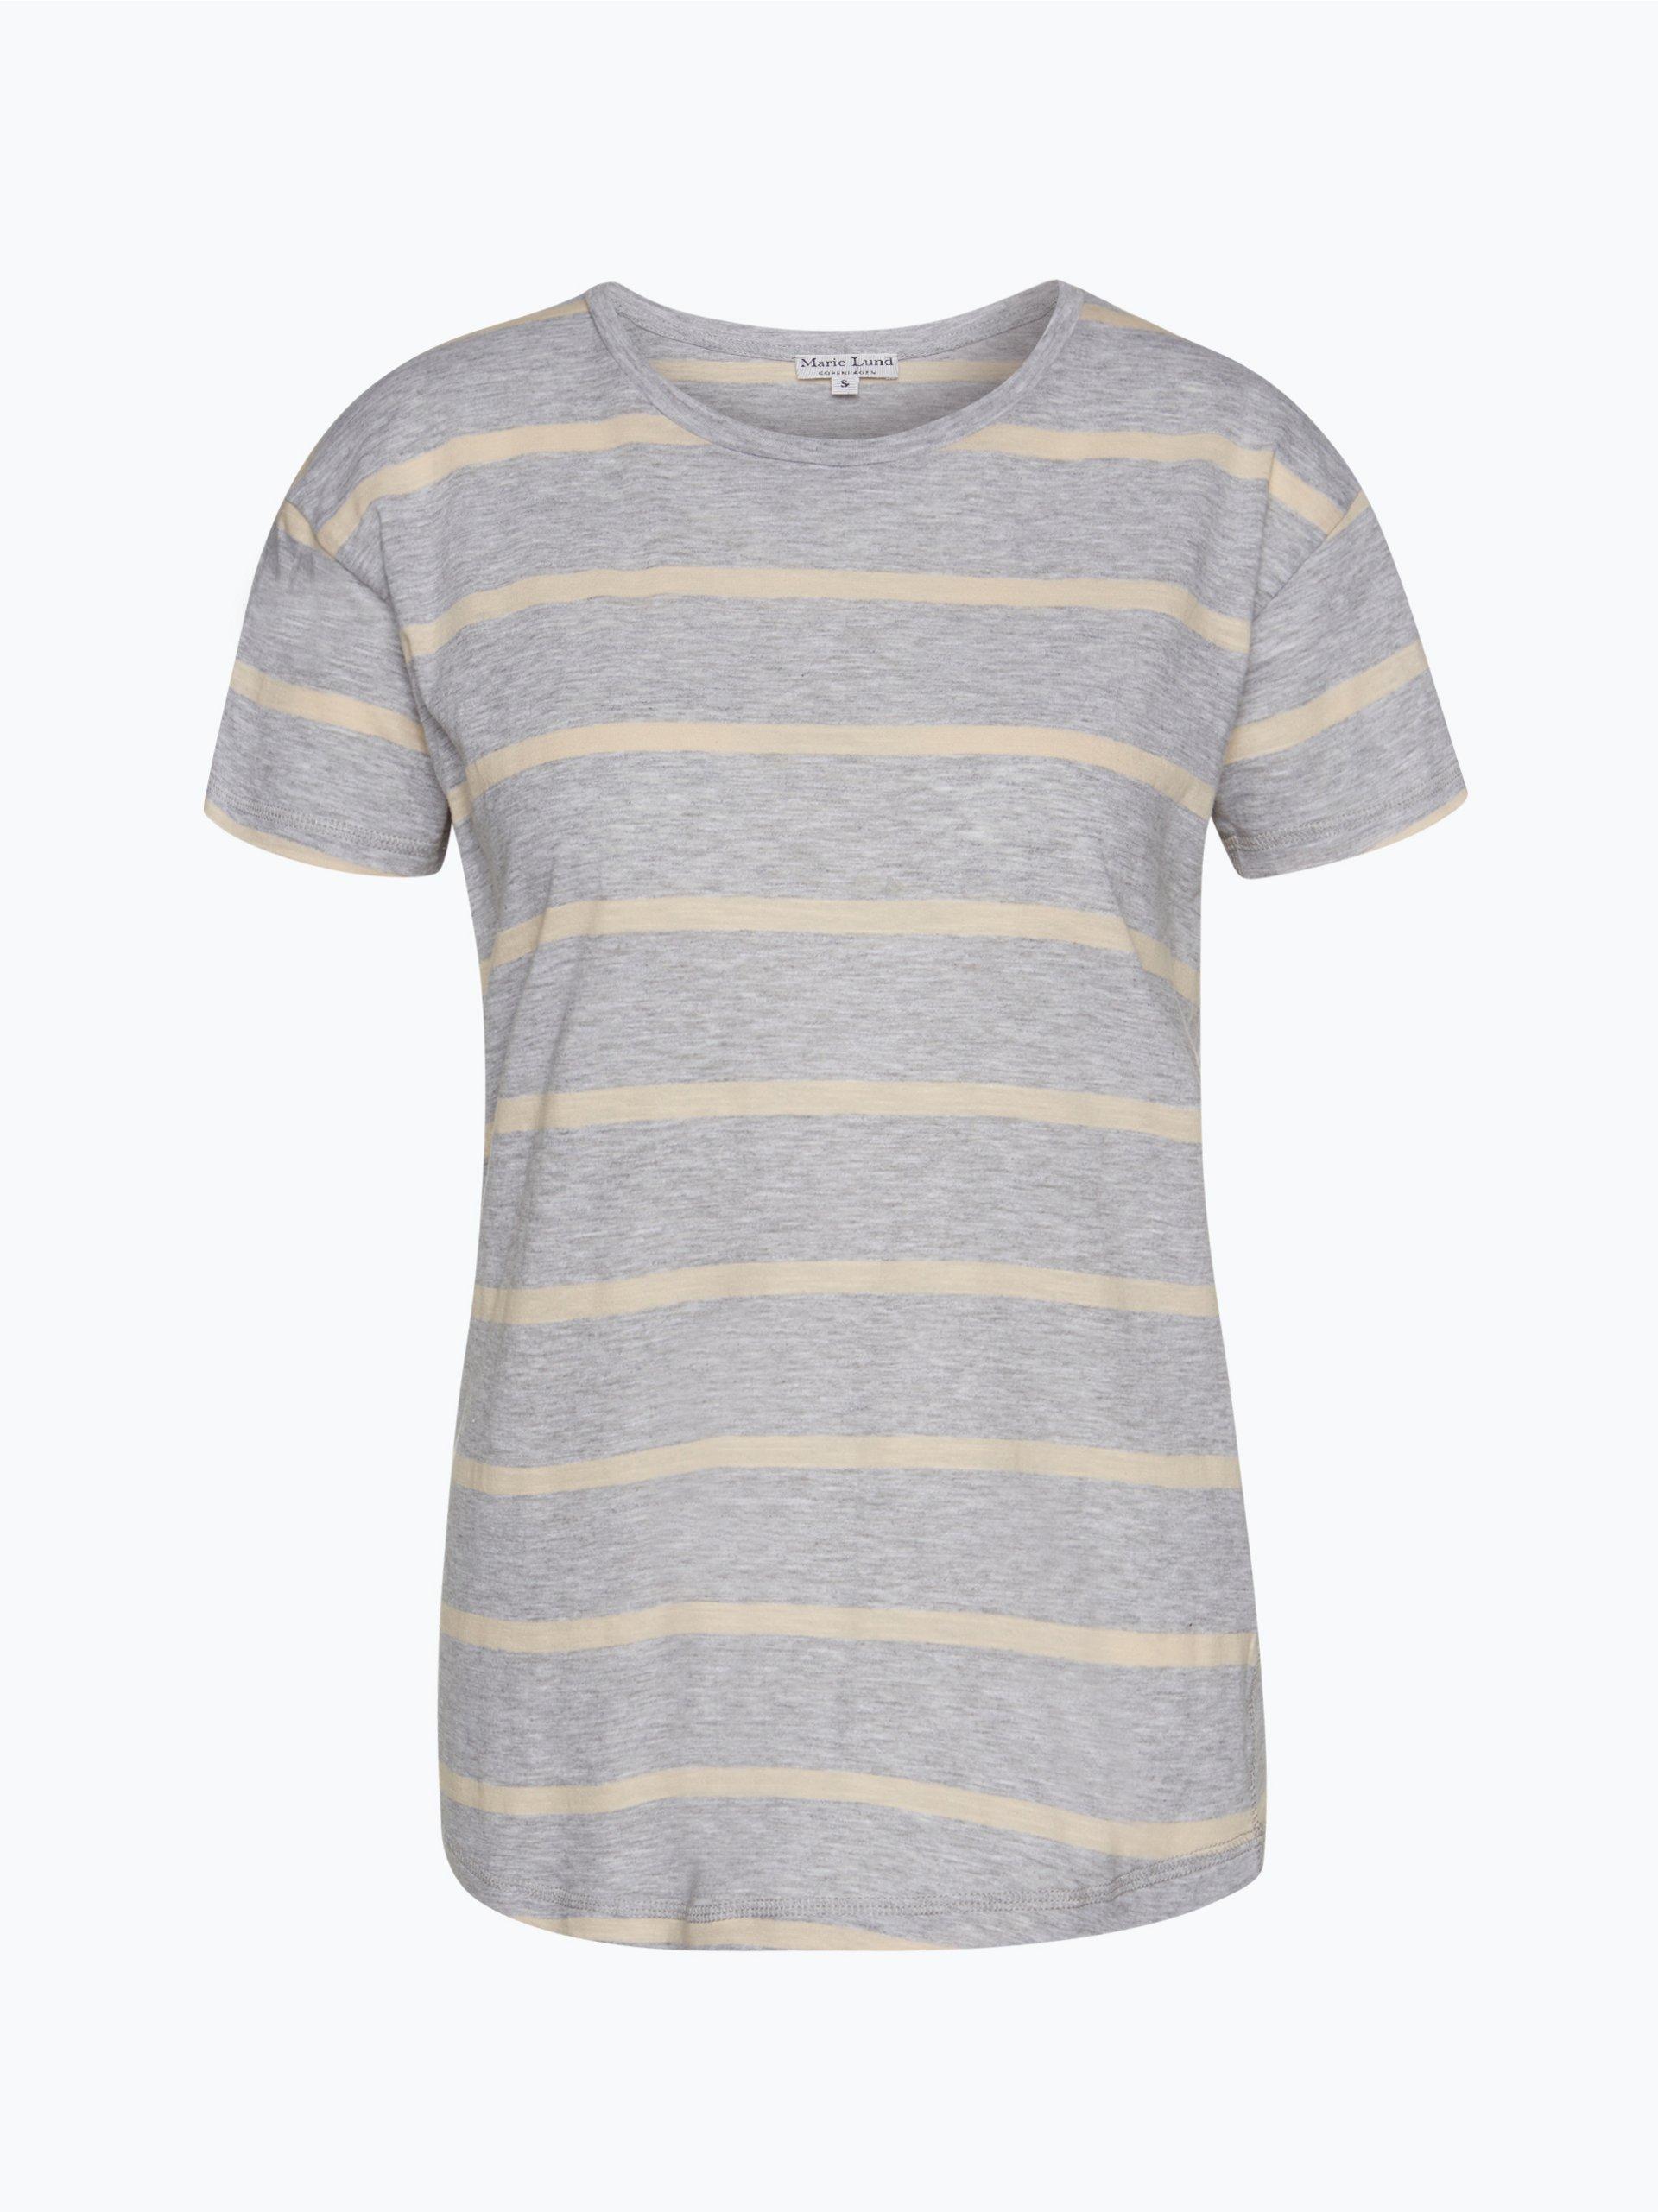 marie lund damen t shirt nude gestreift online kaufen vangraaf com. Black Bedroom Furniture Sets. Home Design Ideas